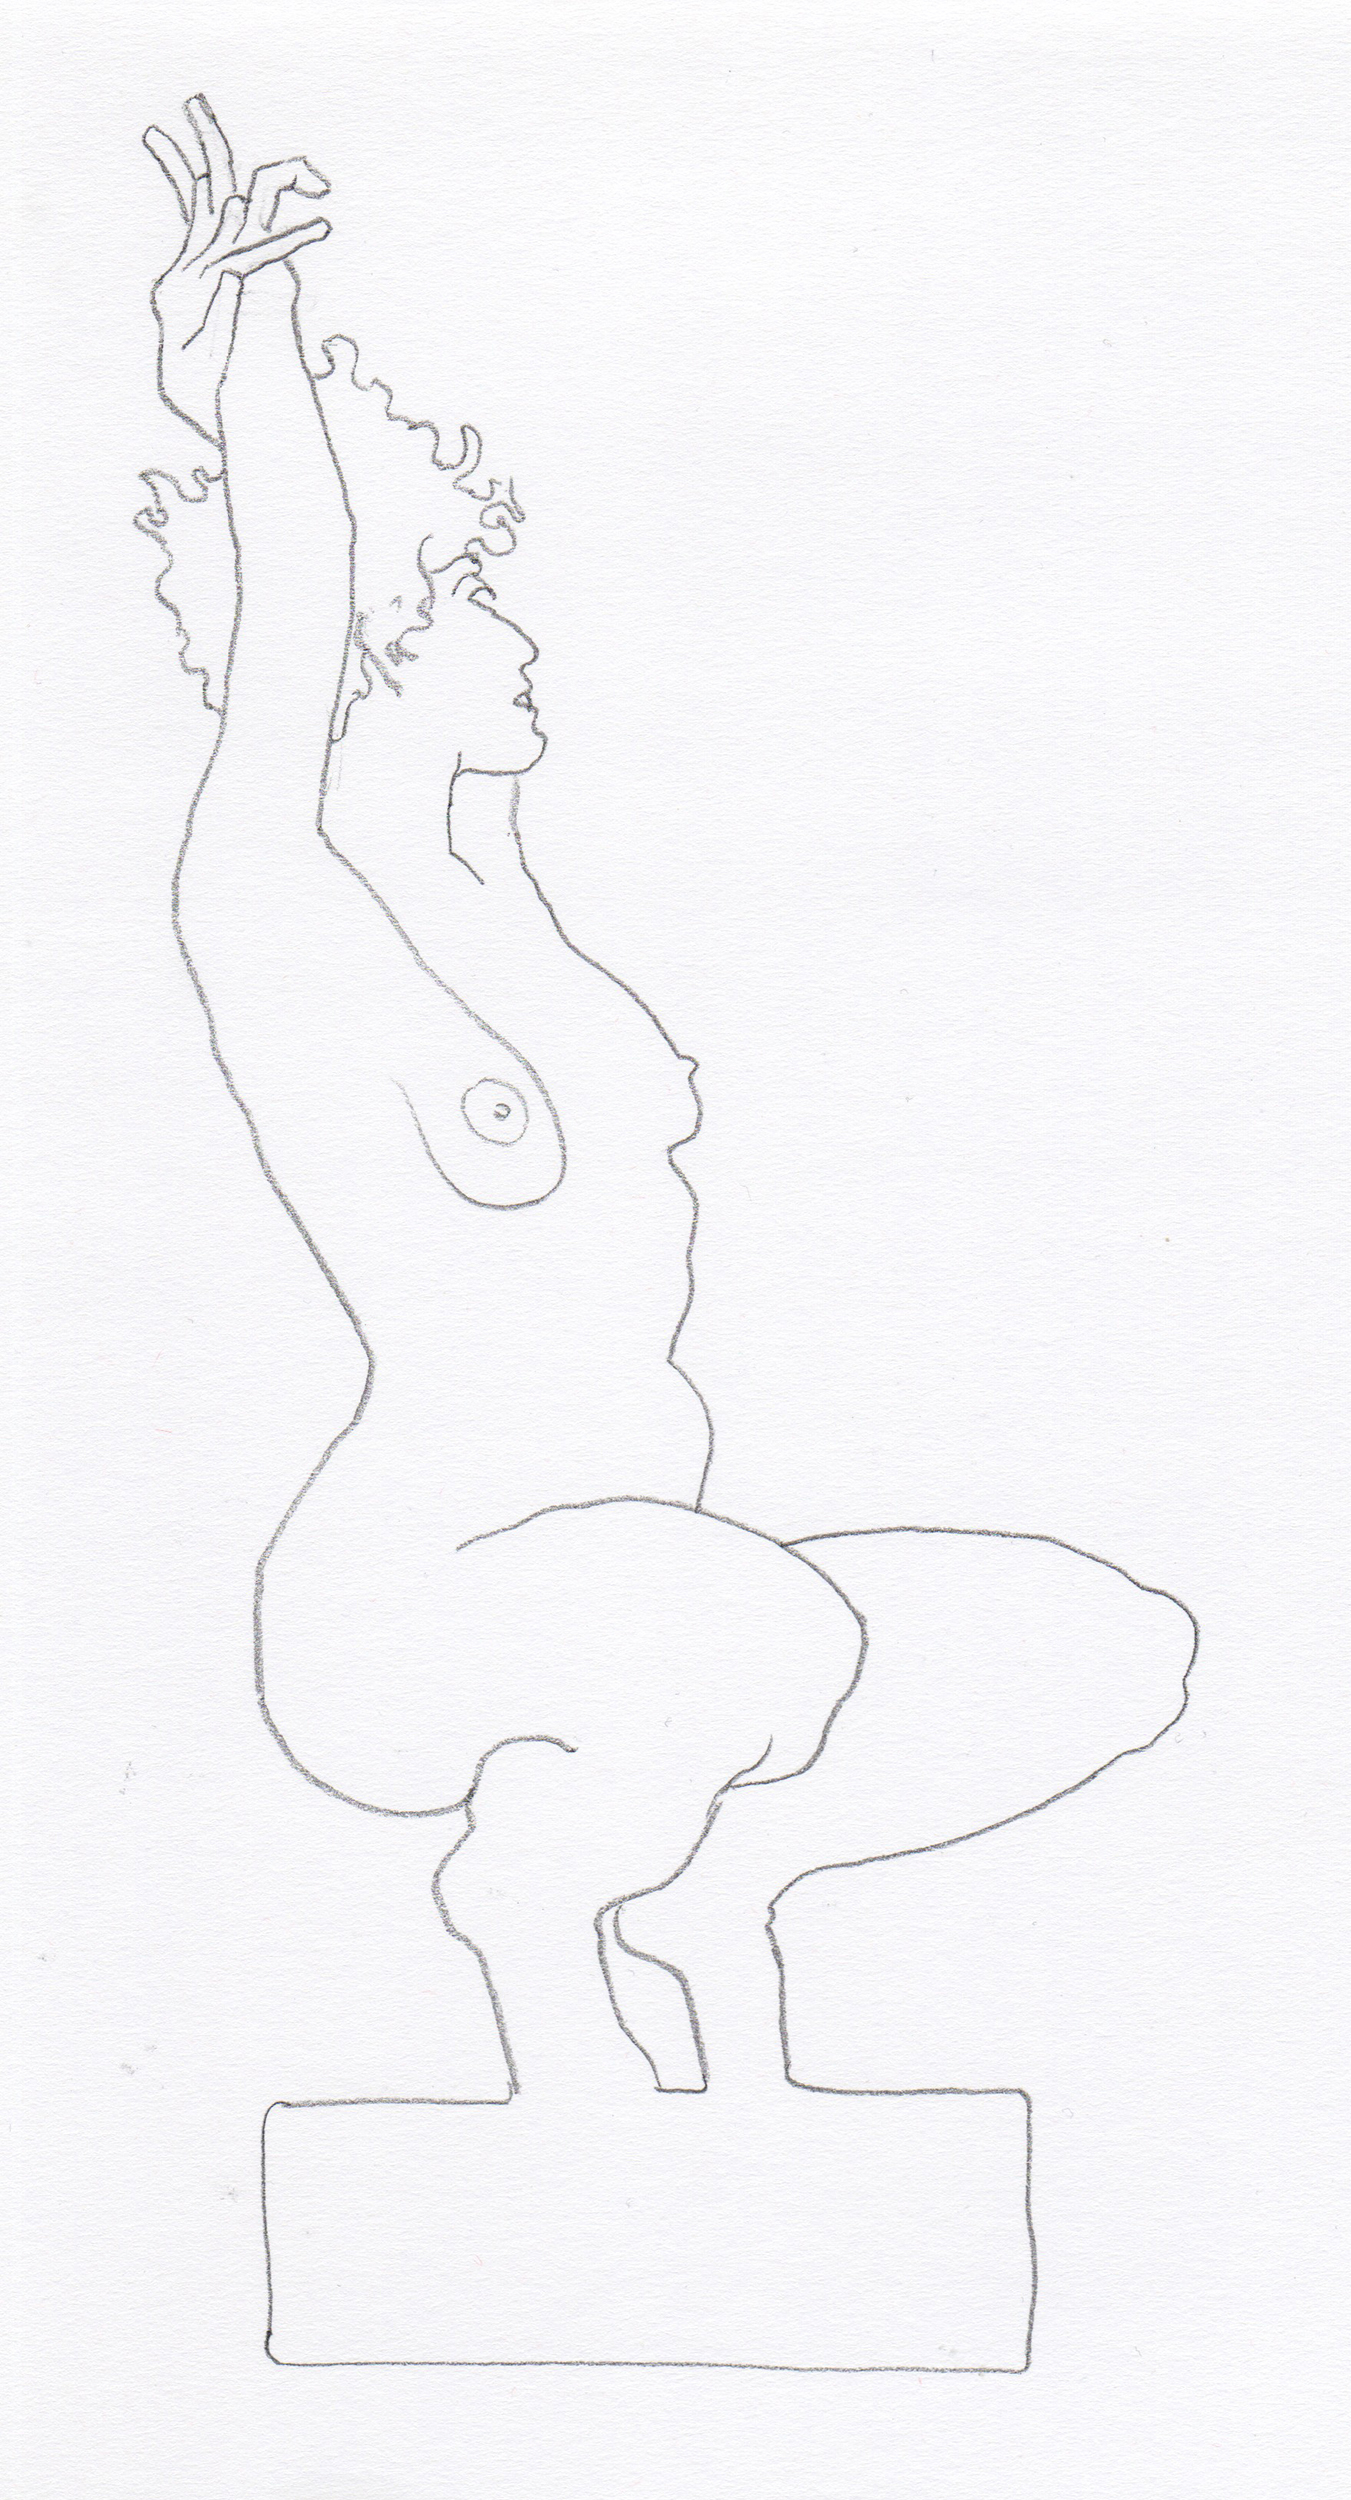 2012_Sketch_F-Beudin_001